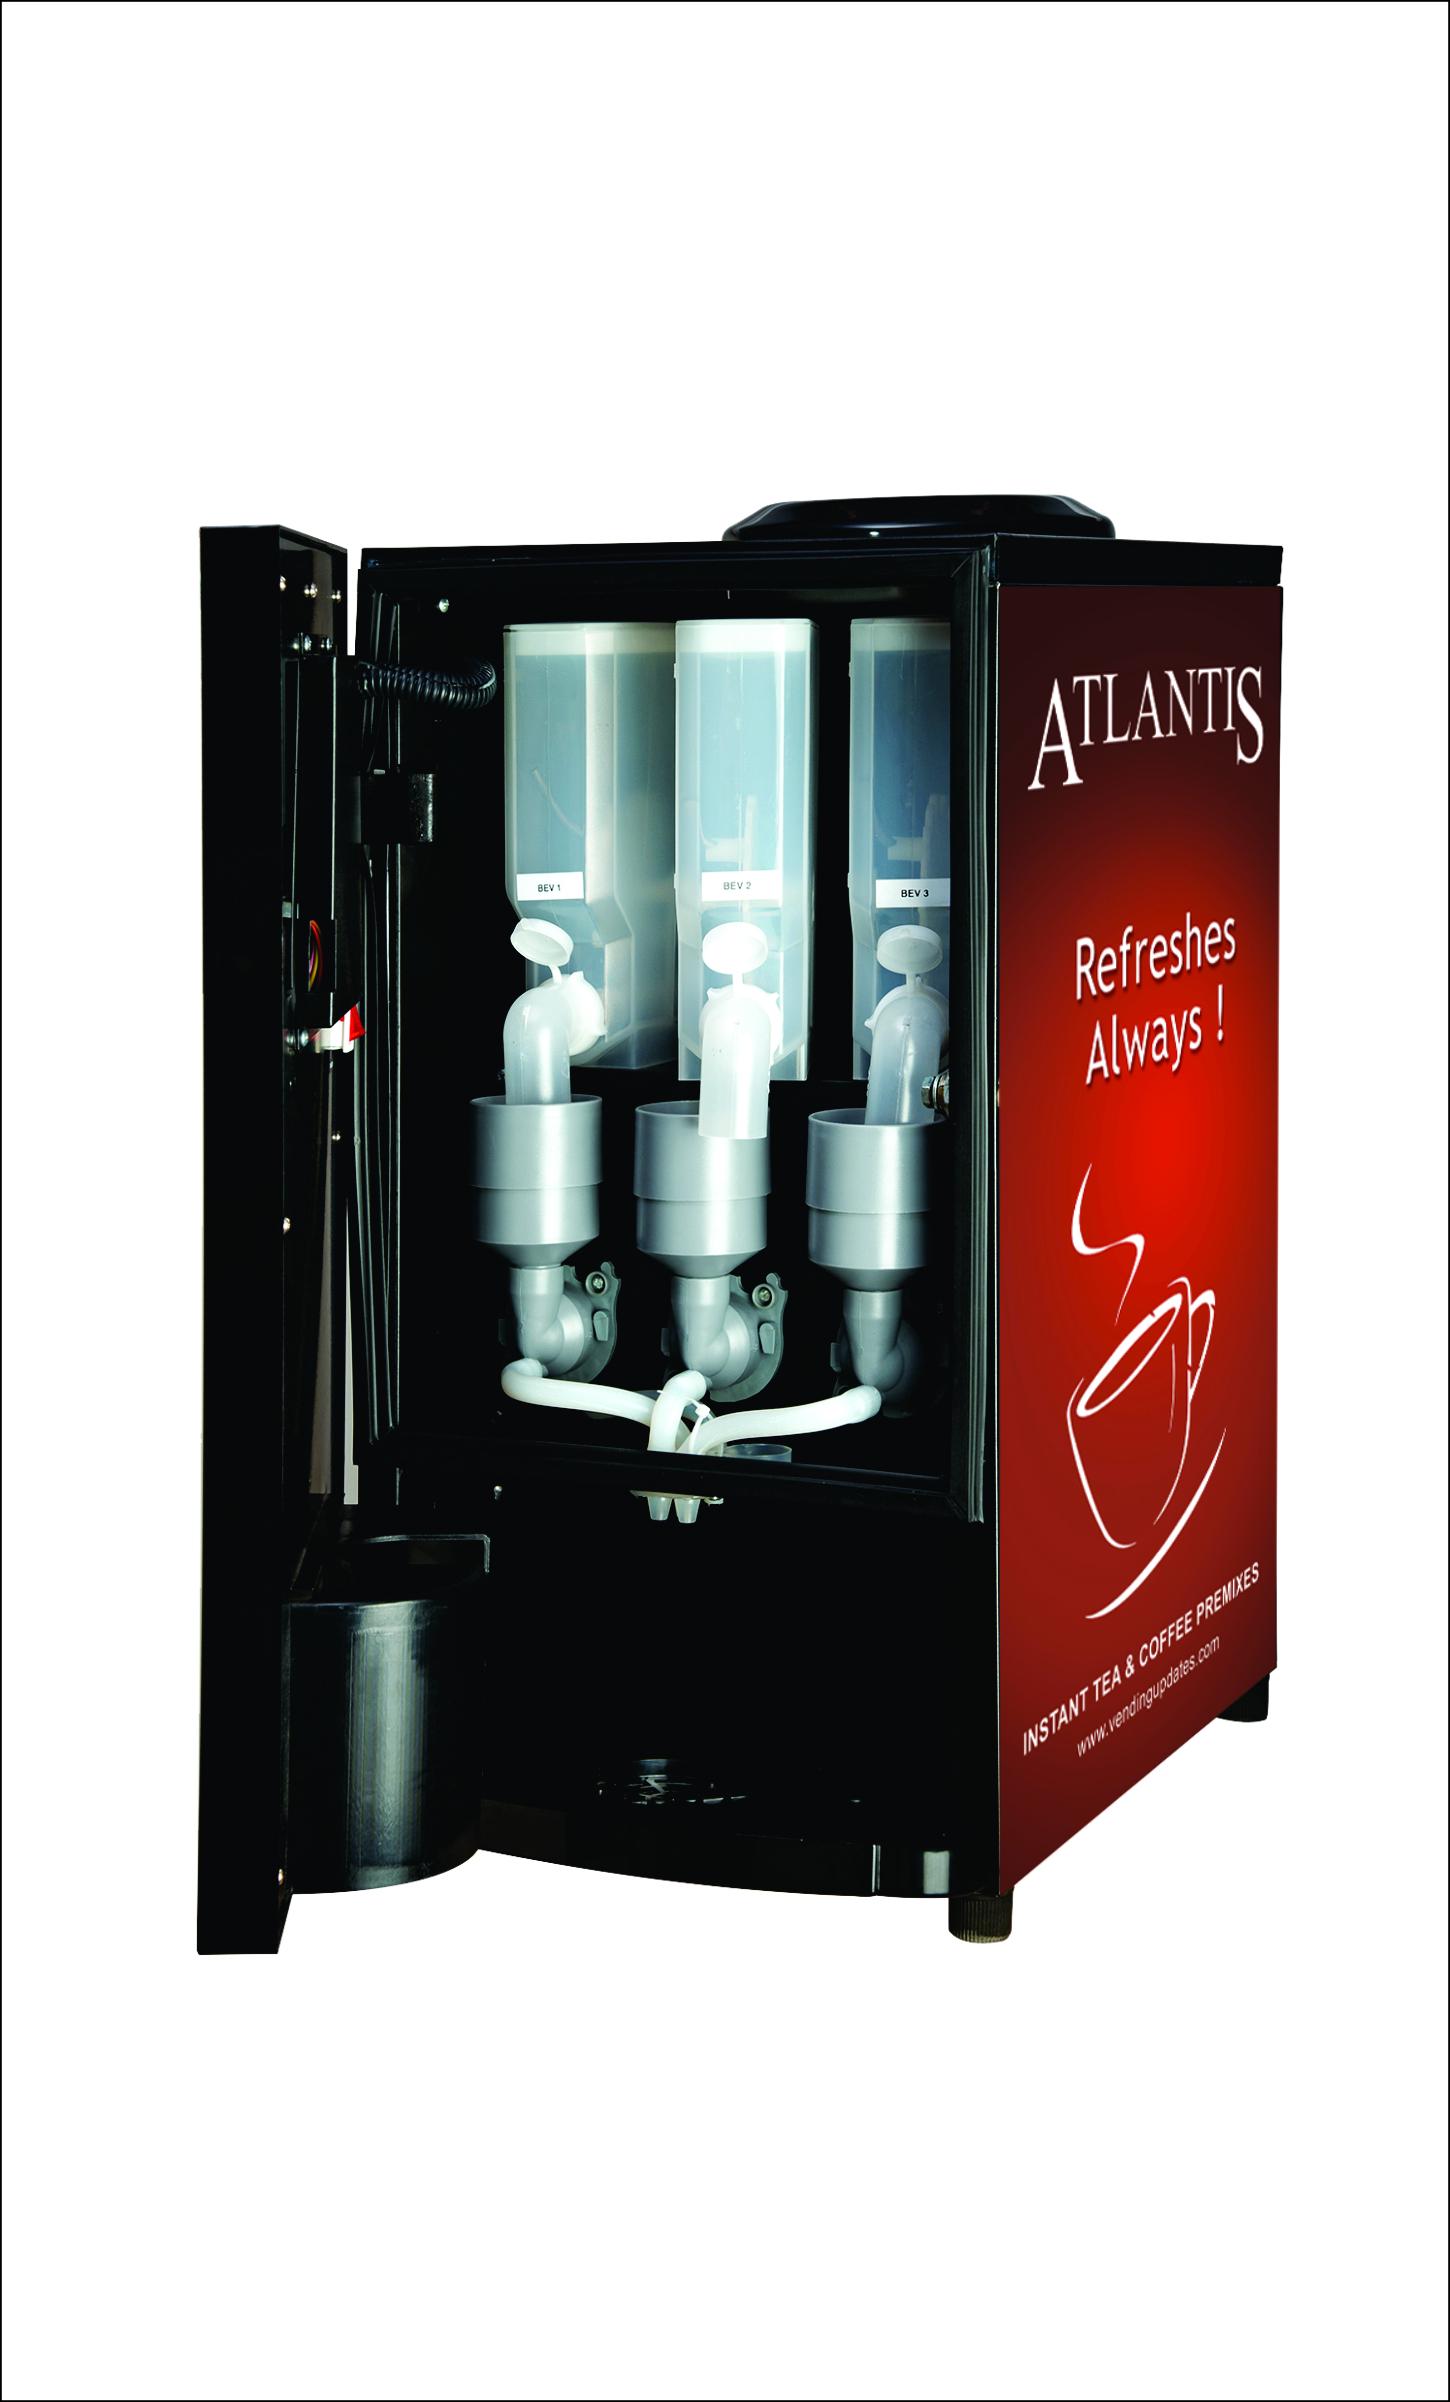 Cafe Mini 2 Lane Tea and Coffee Vending Machine